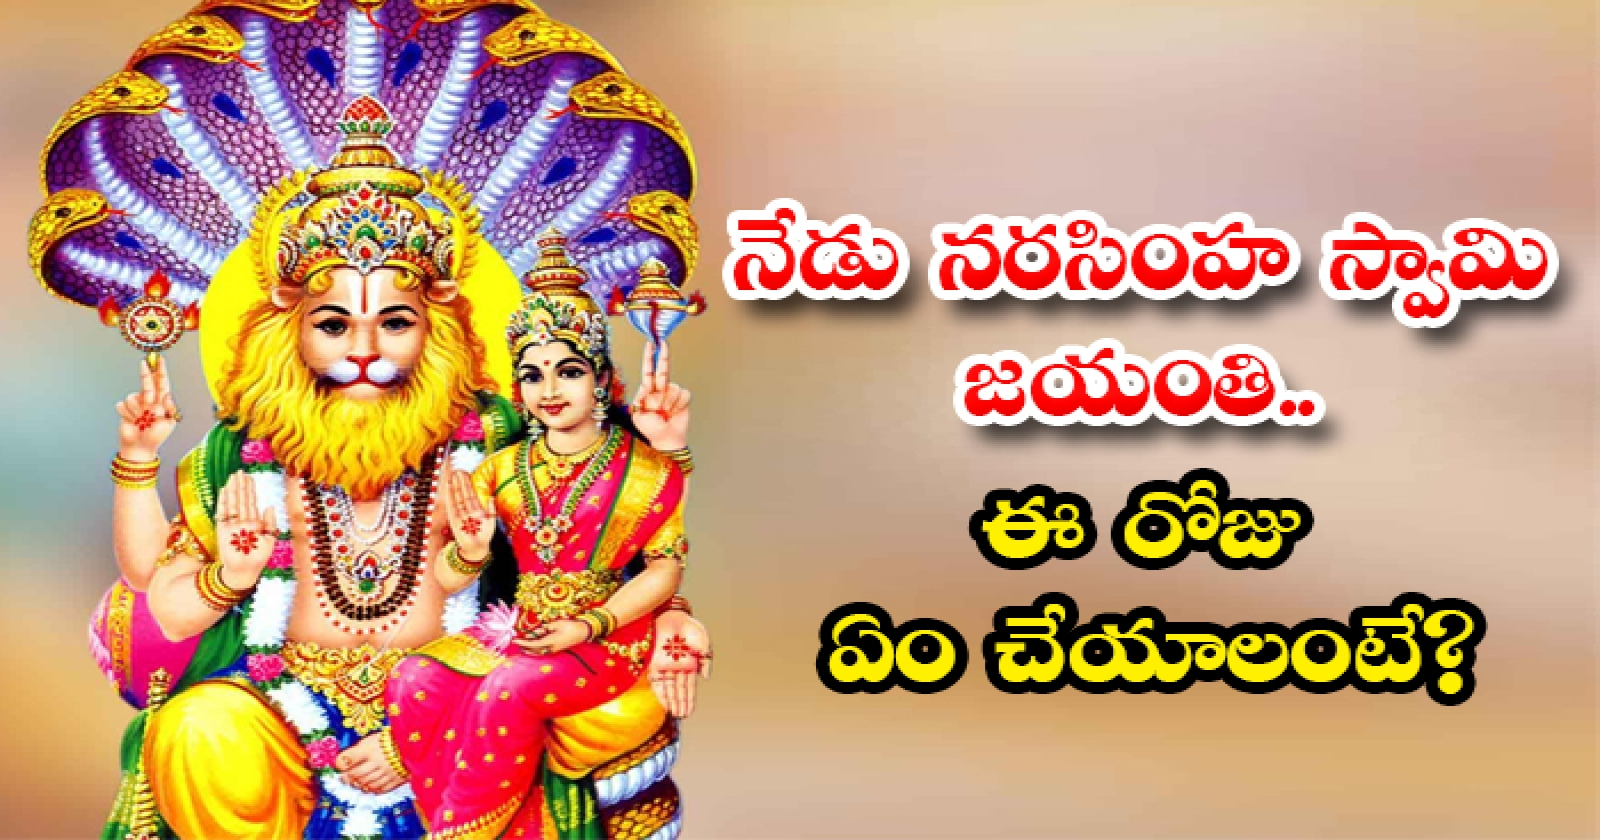 Narsimha Jayanti 2021 Date And Significance-నేడు నరసింహ స్వామి జయంతి.. ఈరోజు ఏం చేయాలంటే-Latest News - Telugu-Telugu Tollywood Photo Image-TeluguStop.com